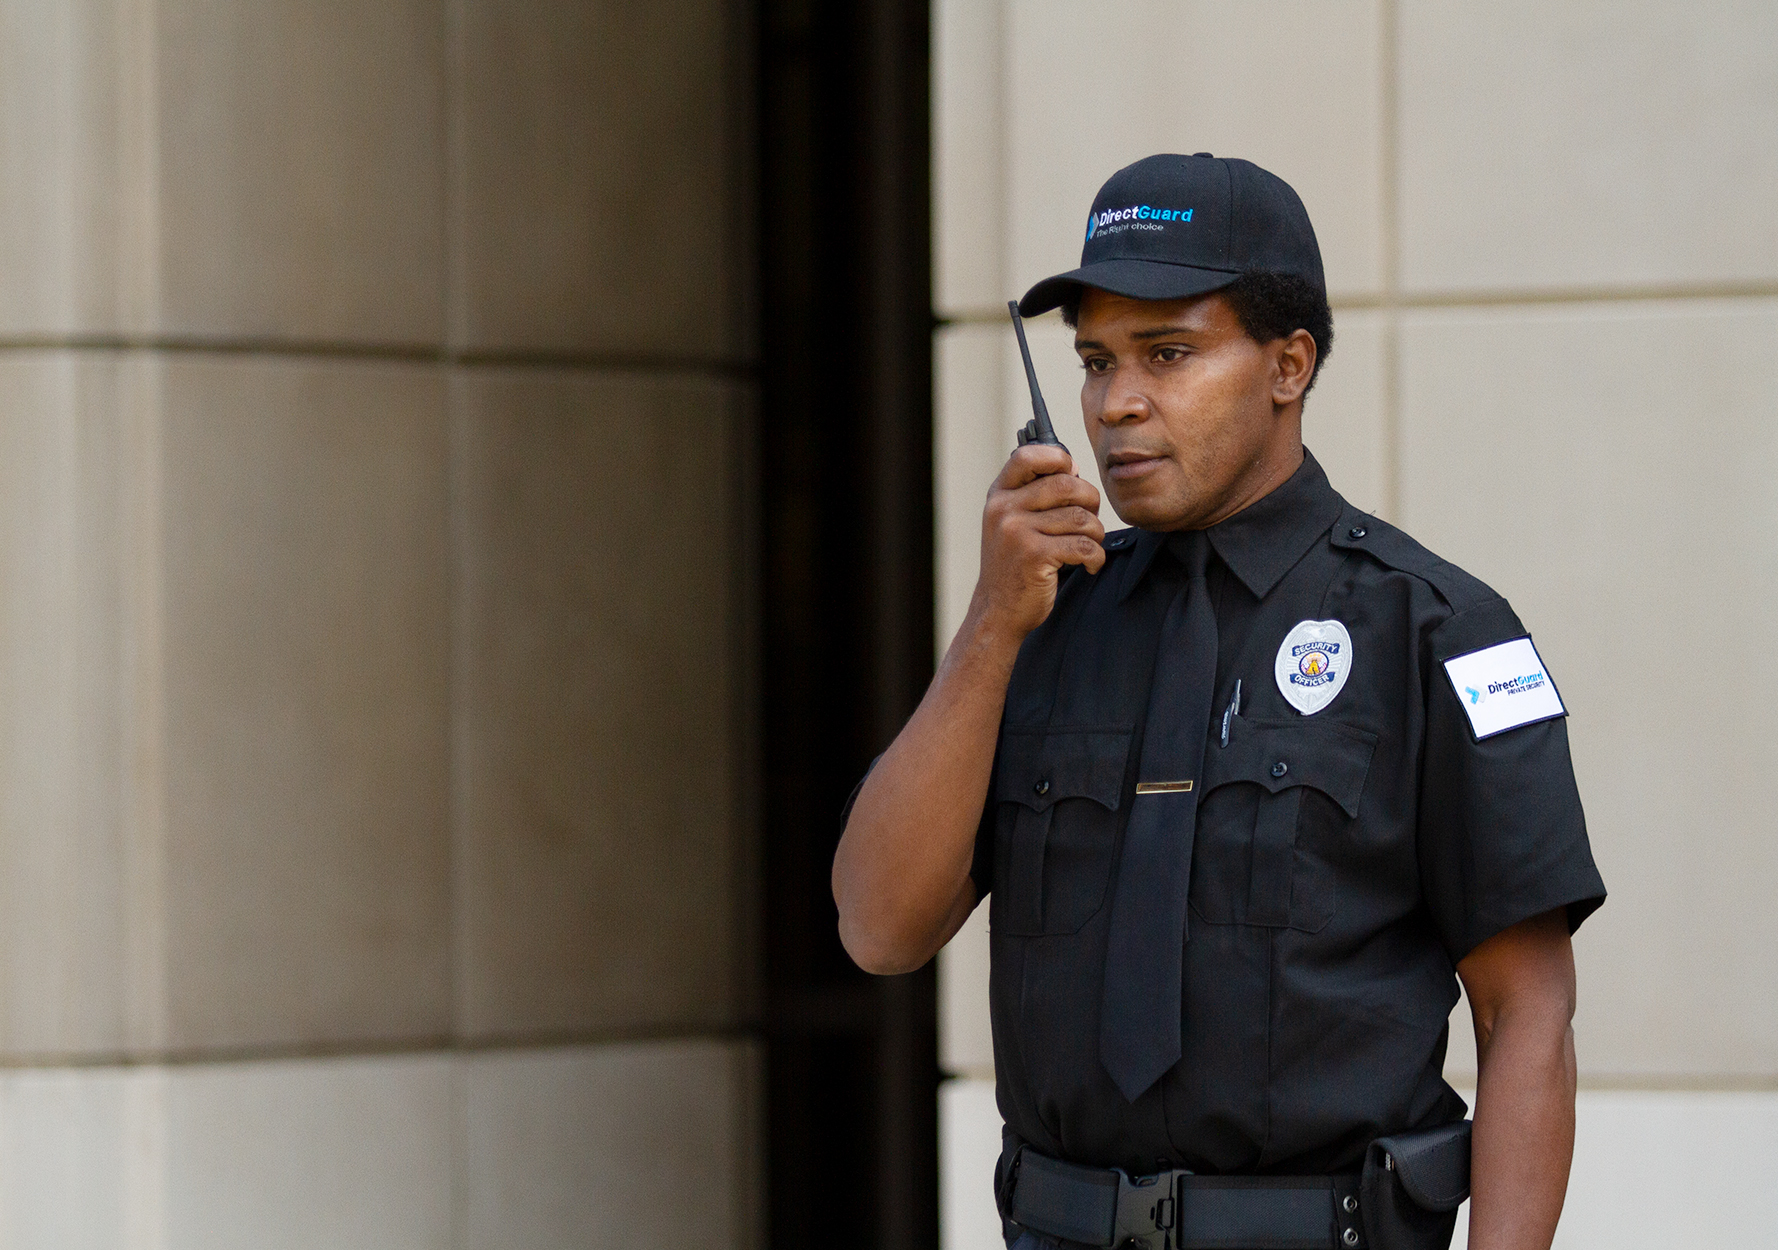 Security Guard in California